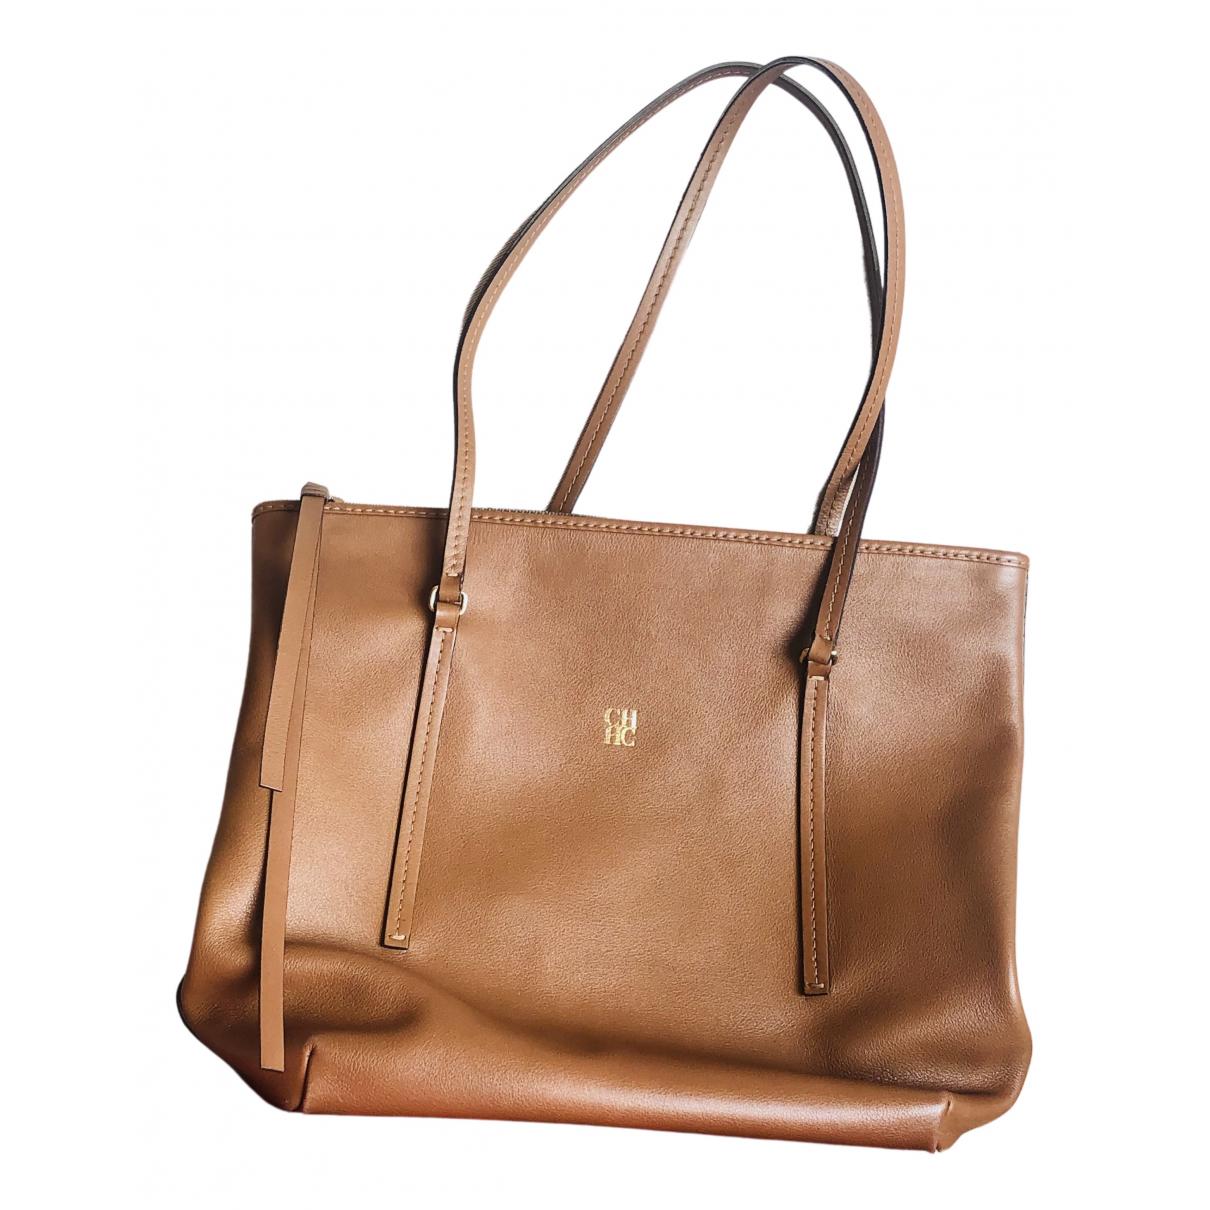 Carolina Herrera N Camel Leather handbag for Women N